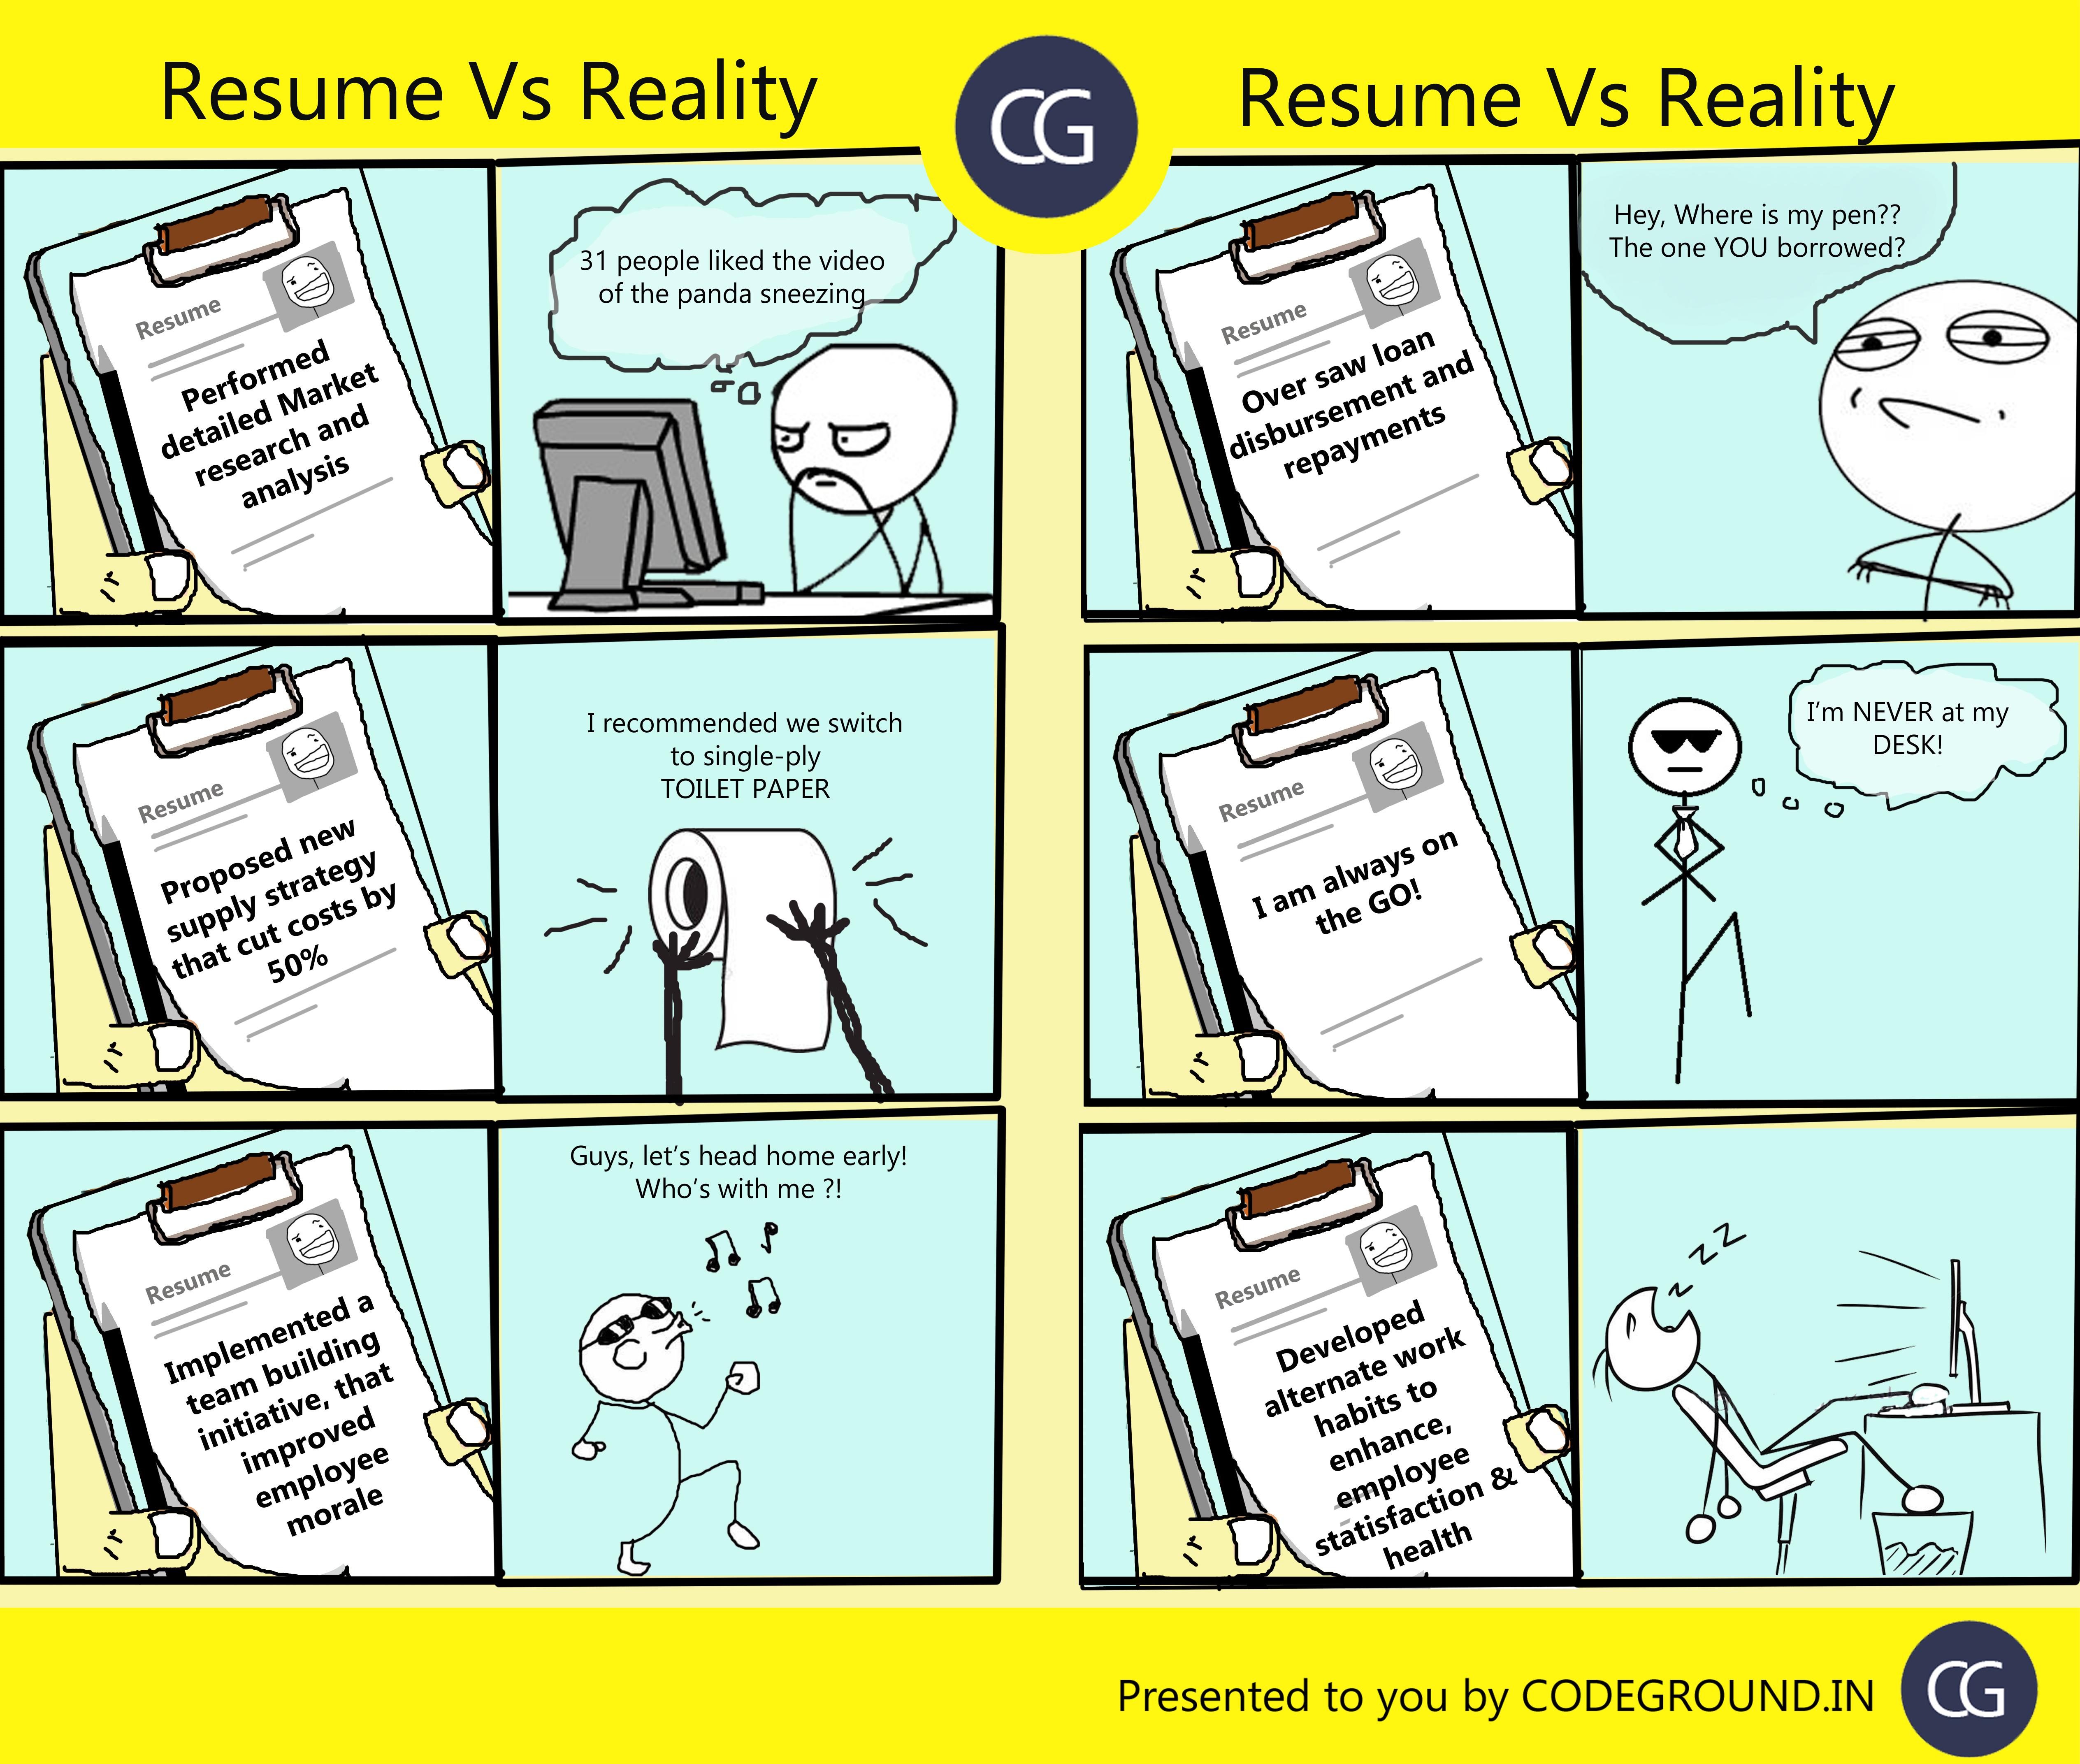 resume-vs-reality